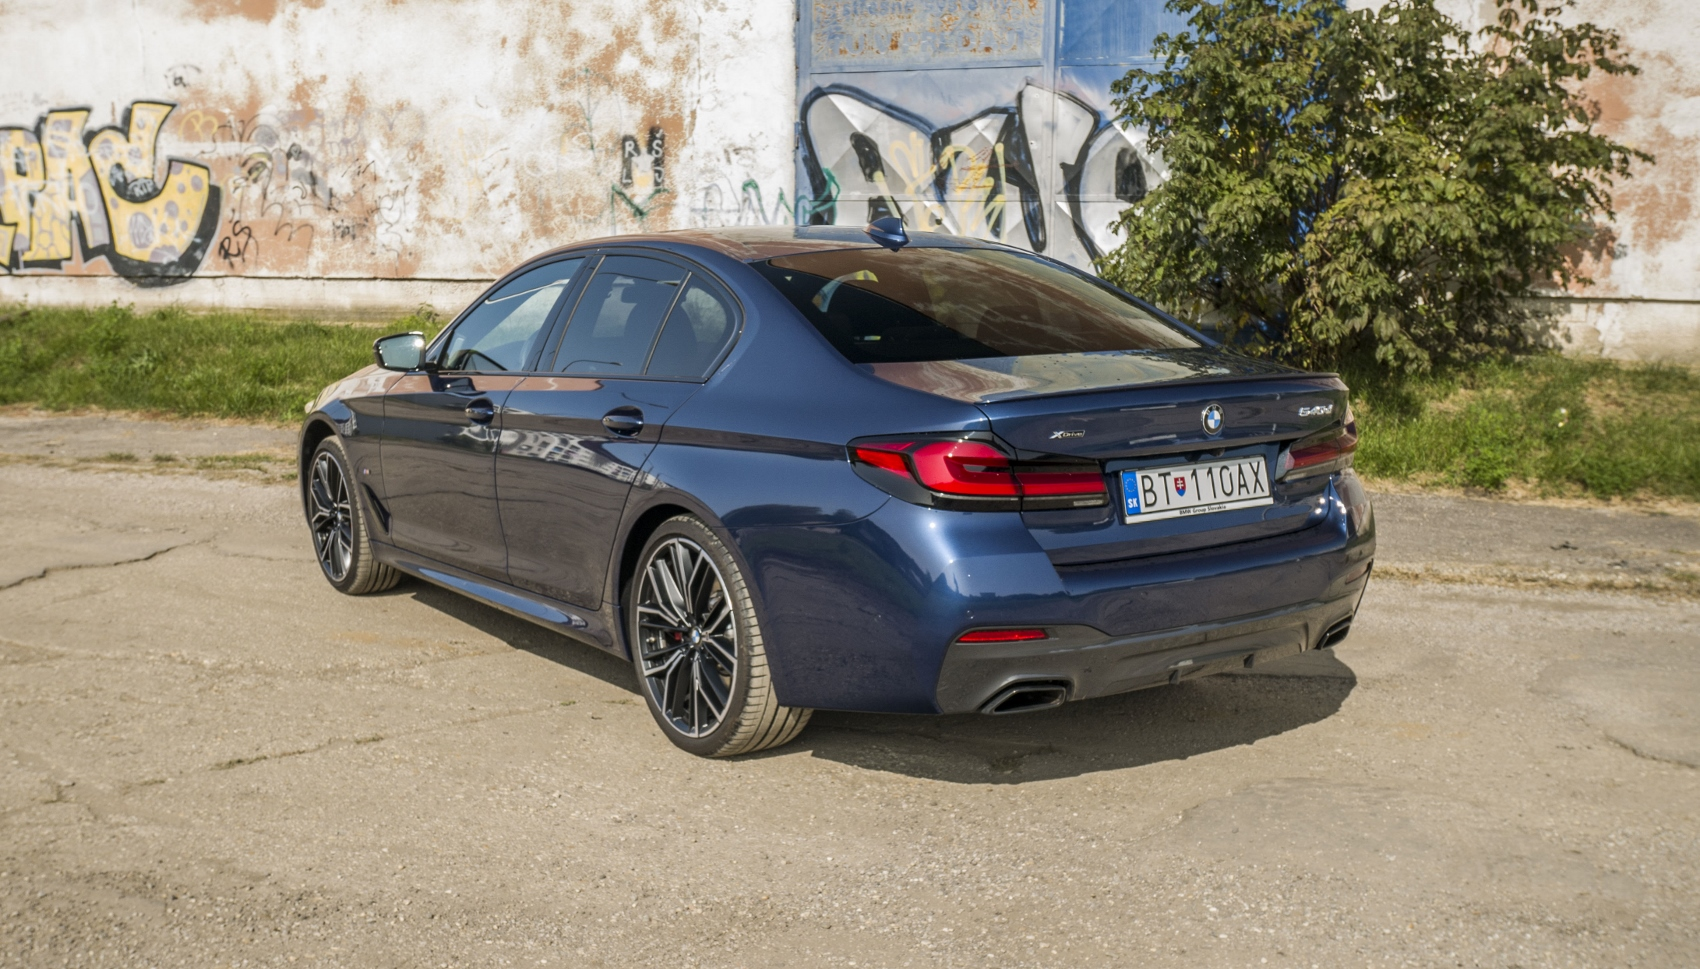 Test: Najsilnejšou zbraňou BMW 540d ostáva podvozok O3Yr6pzeJP bmw-540d-11